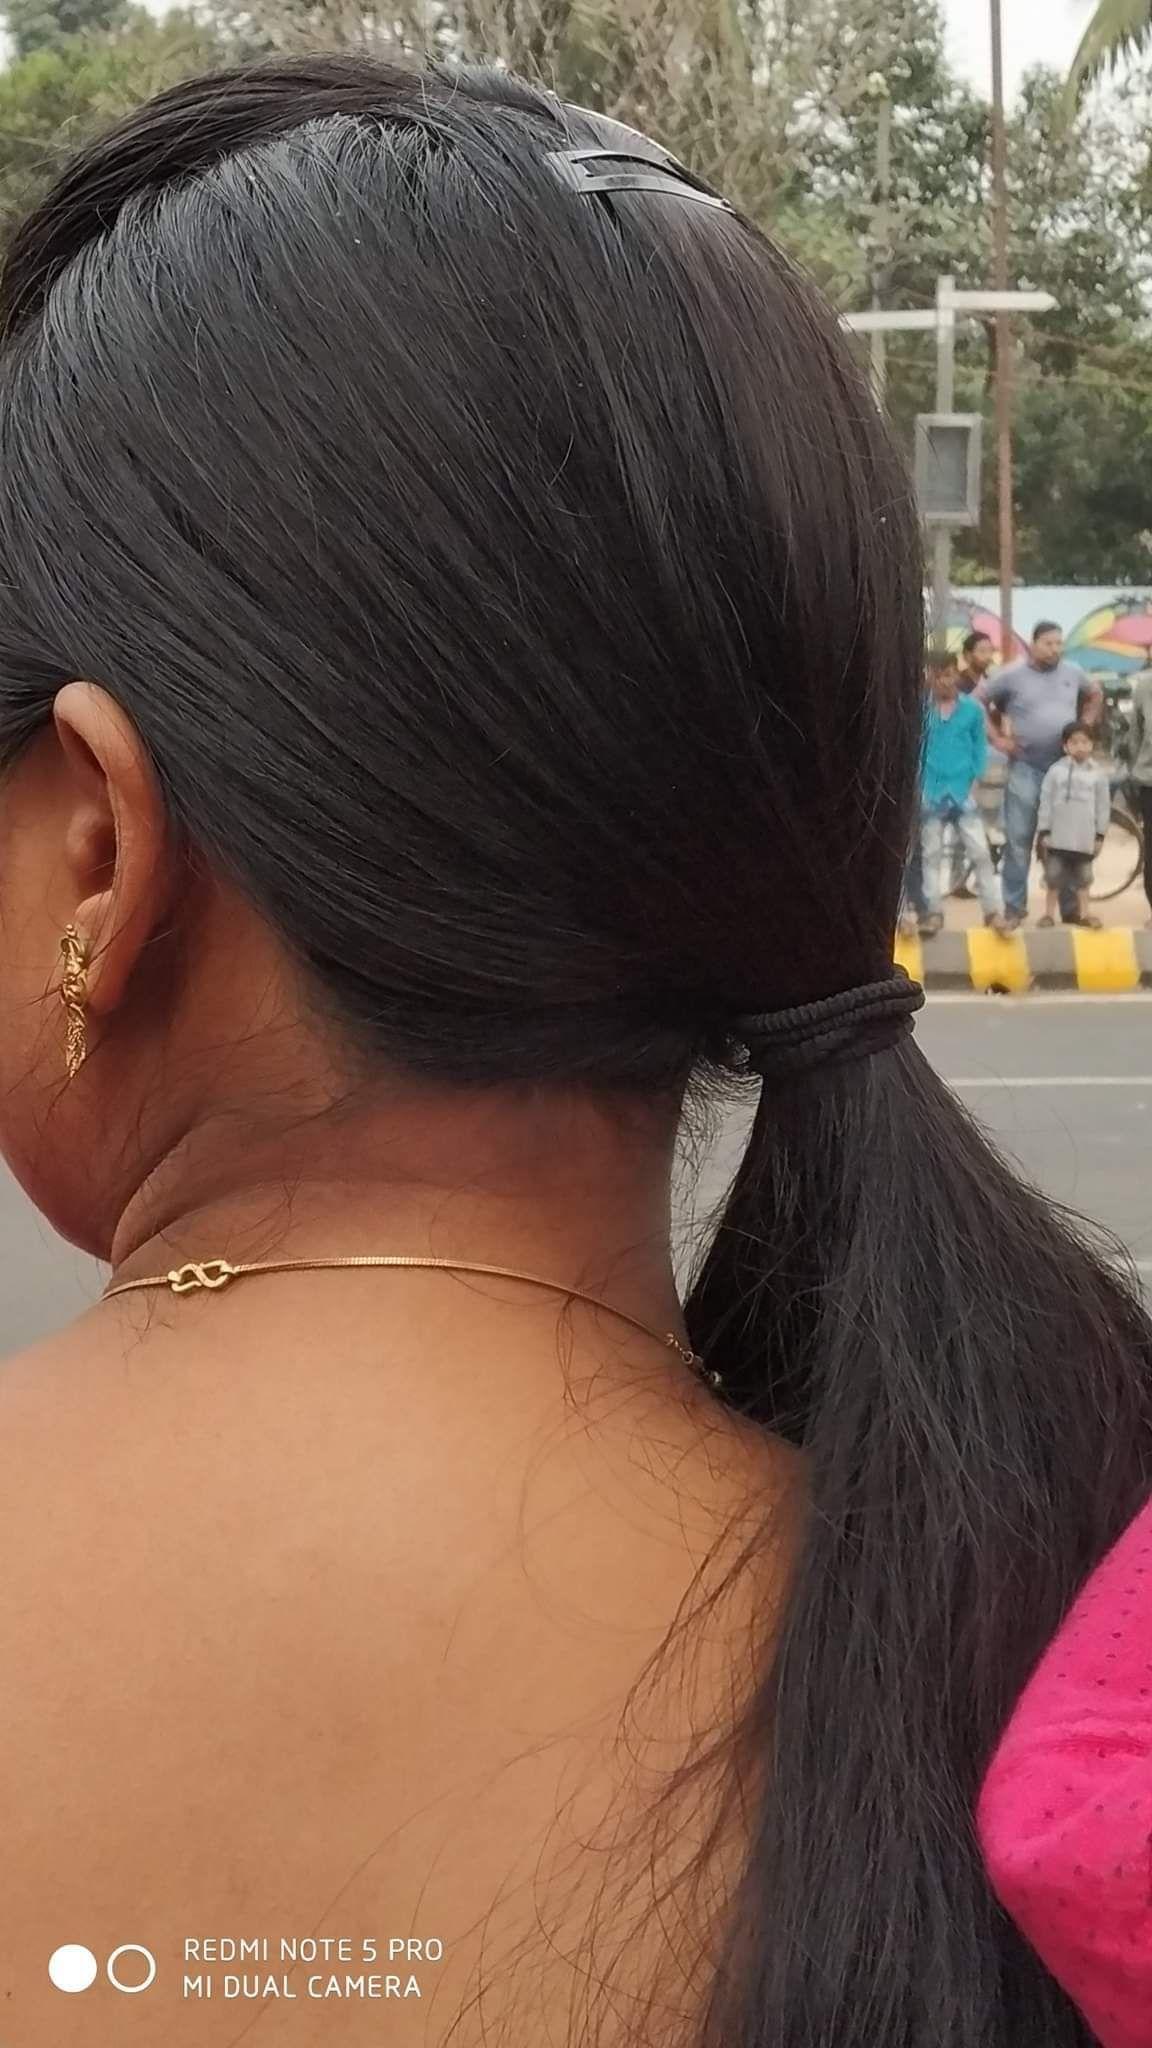 Pin by Car 🚗Saling on fairozkhan | Long indian hair, Ponytail hairstyles, Bun hairstyles